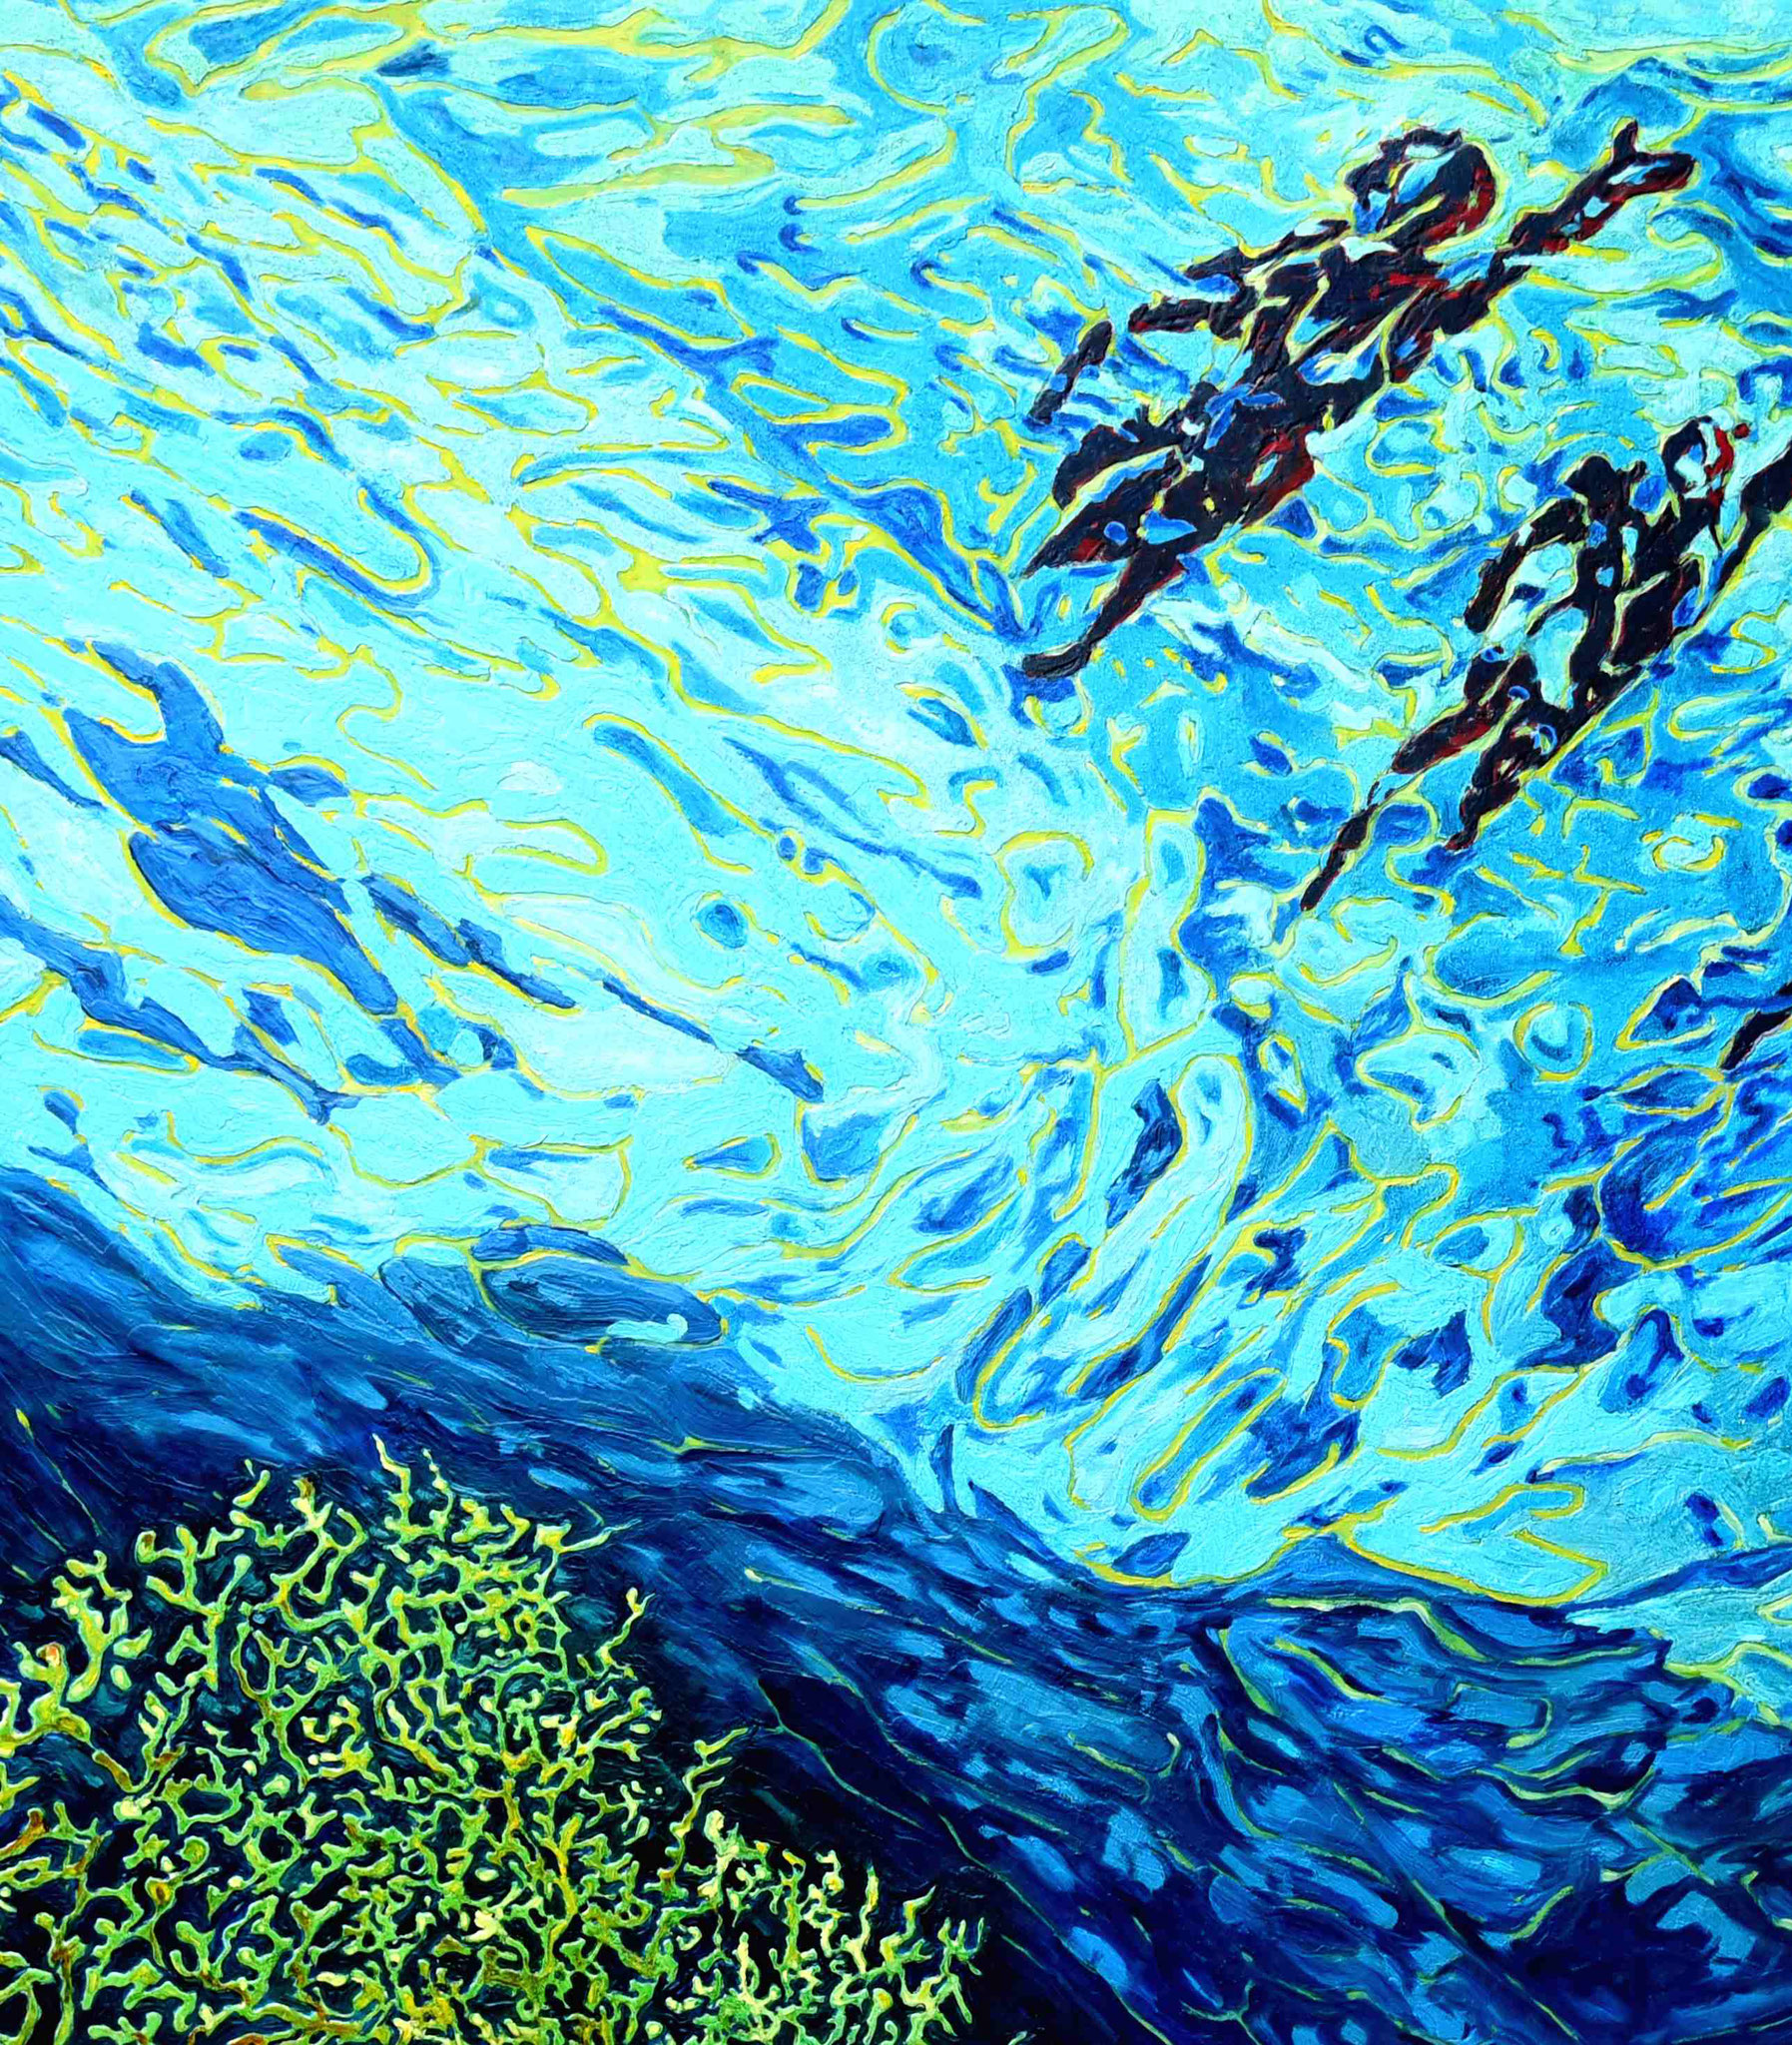 """Filitosa VIII - Meeresblume""-2019-Öl auf LW-140*120cm-Ausschnitt"